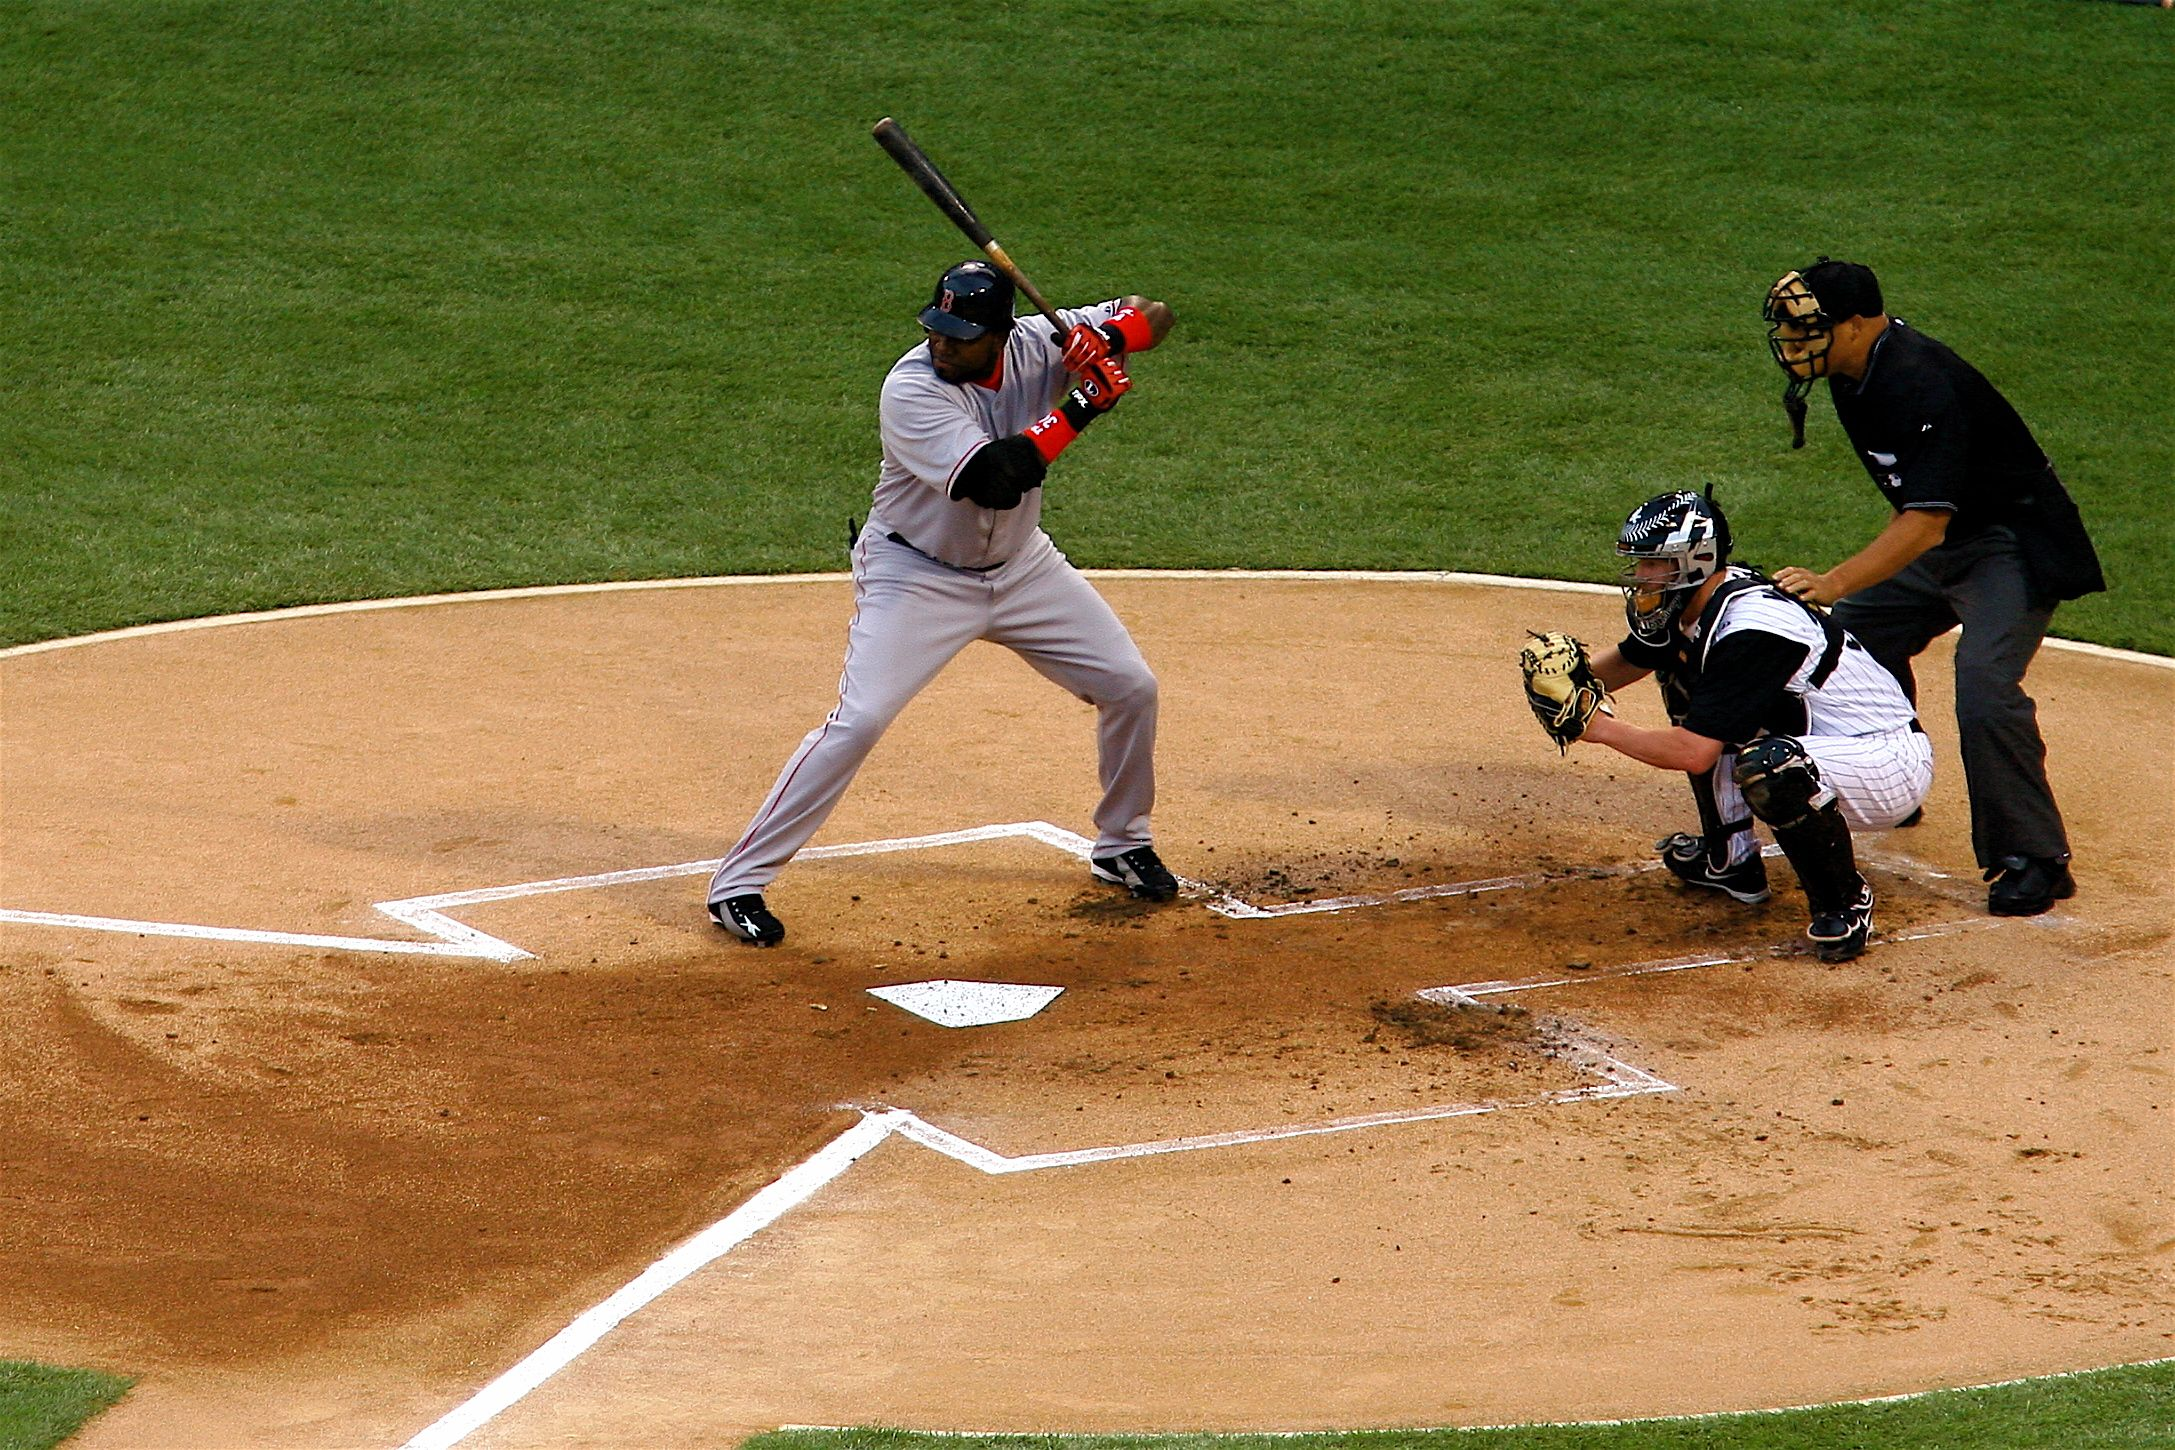 Boss Ortiz Red Sox Batters Box Baseball Cleats Baseball Baseball Tournament